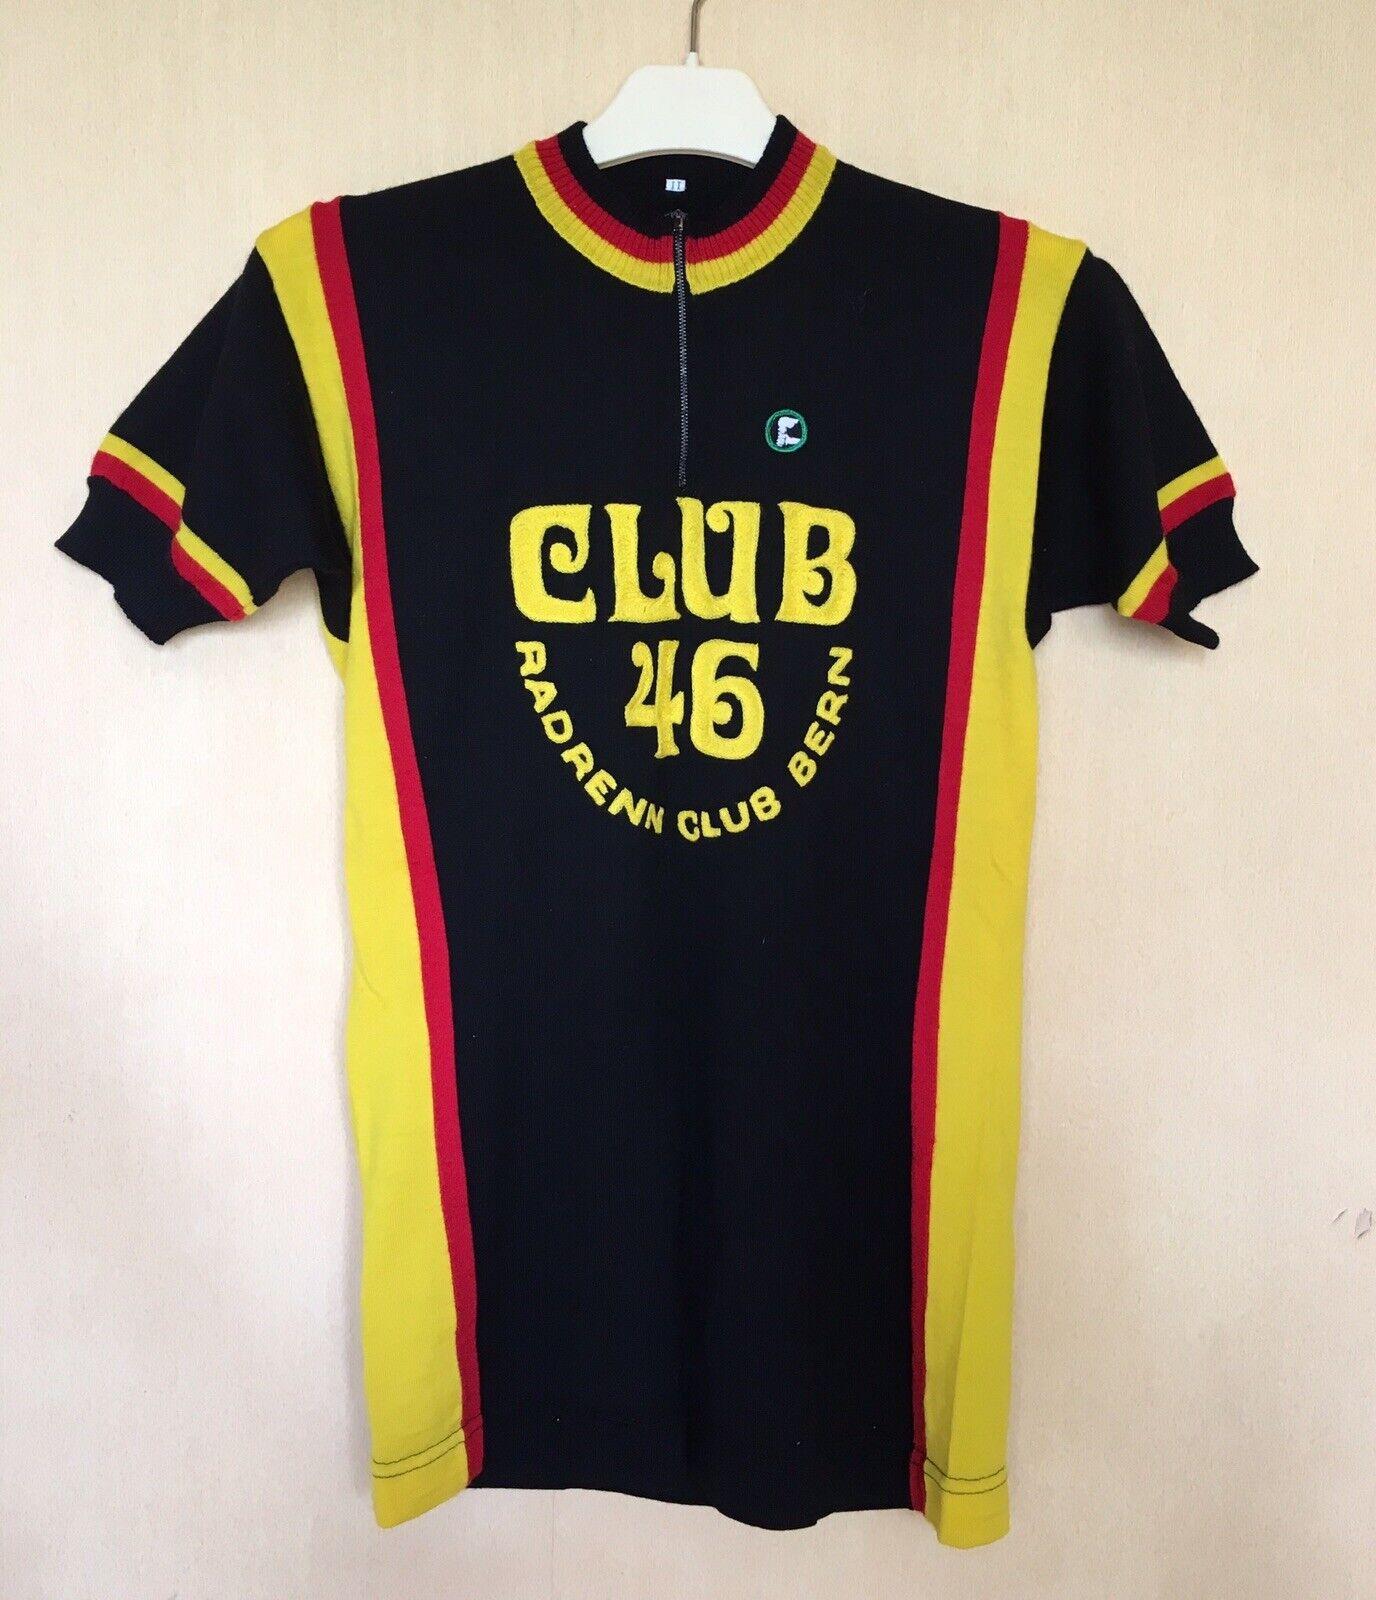 CYCLING JERSEY VINTAGE TRIKOT CLUB 46 RADENN CLUB BERN VITTORE GIANNI EROICA